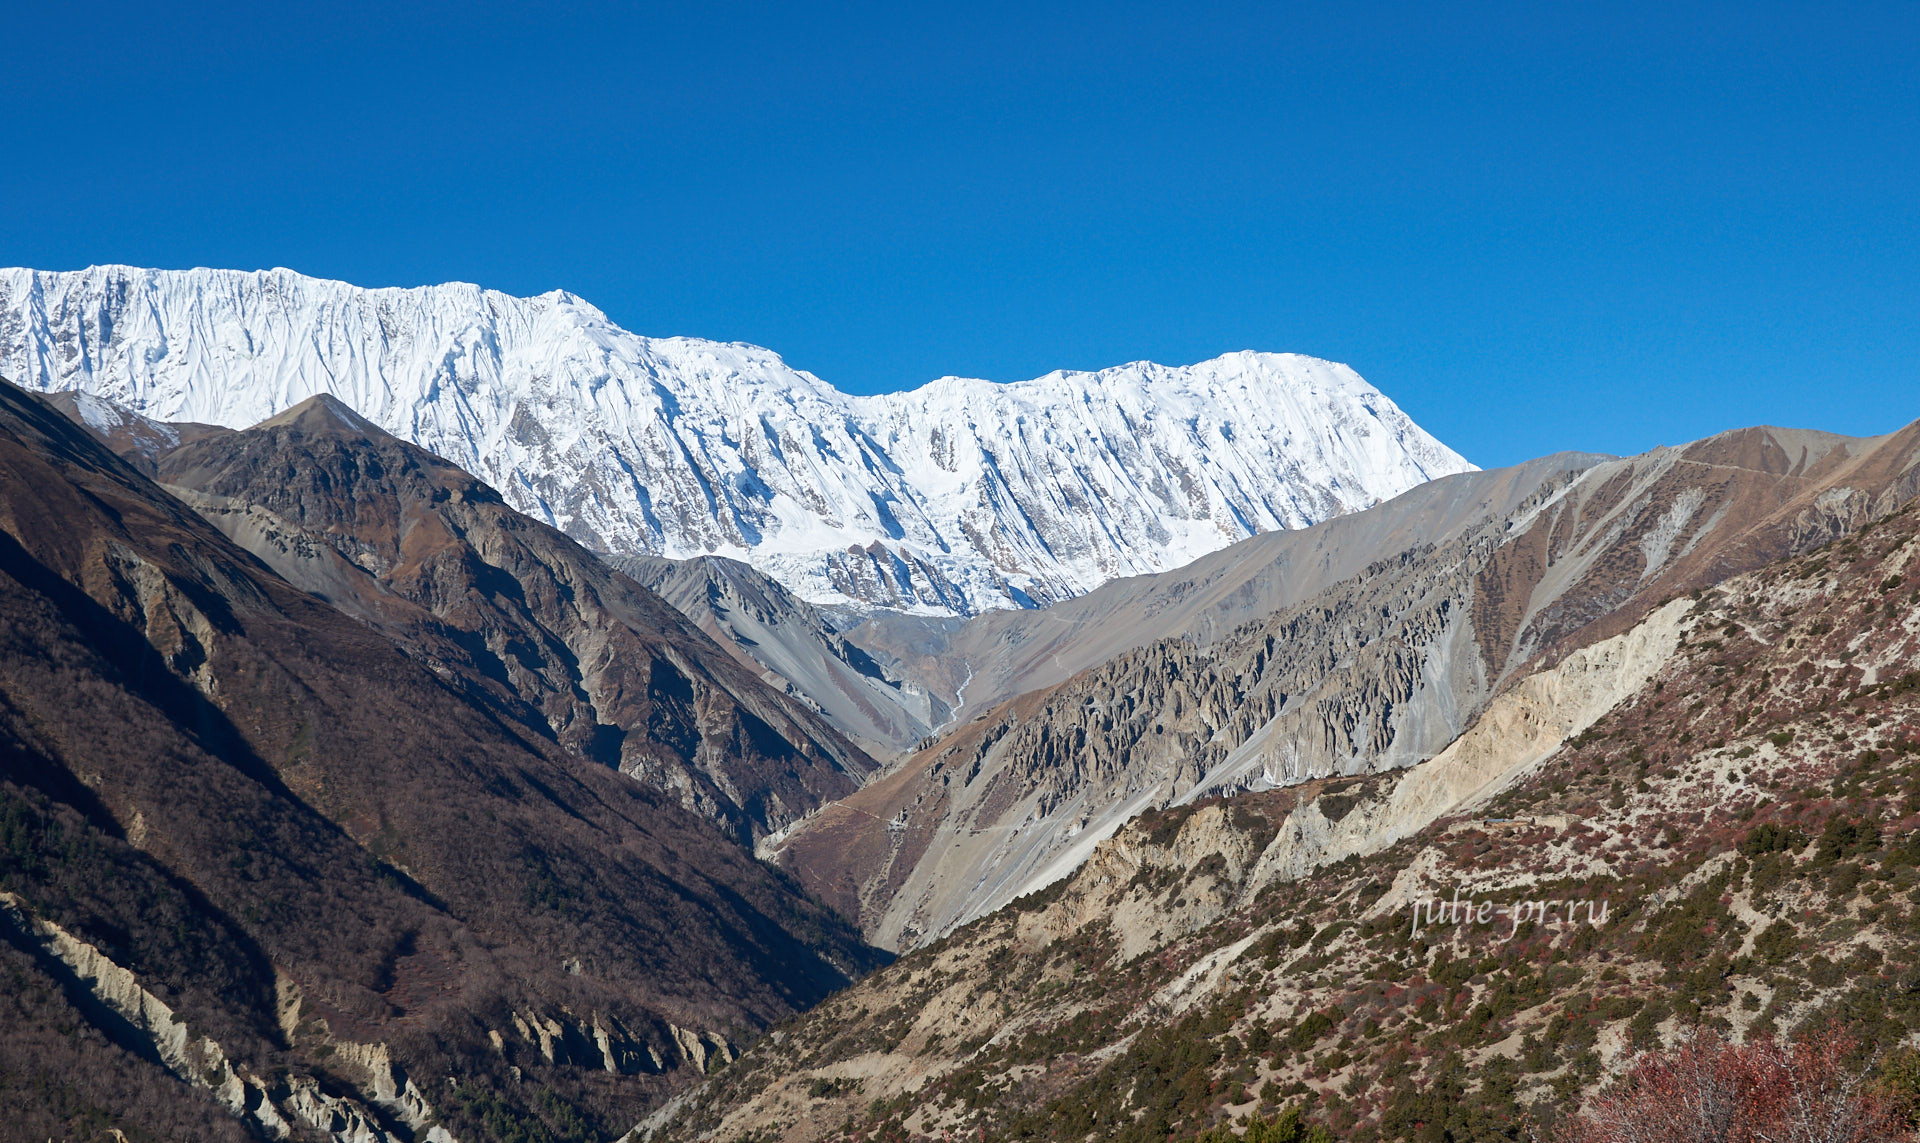 Непал. Пик Тиличо и Большой Барьер Аннапурны